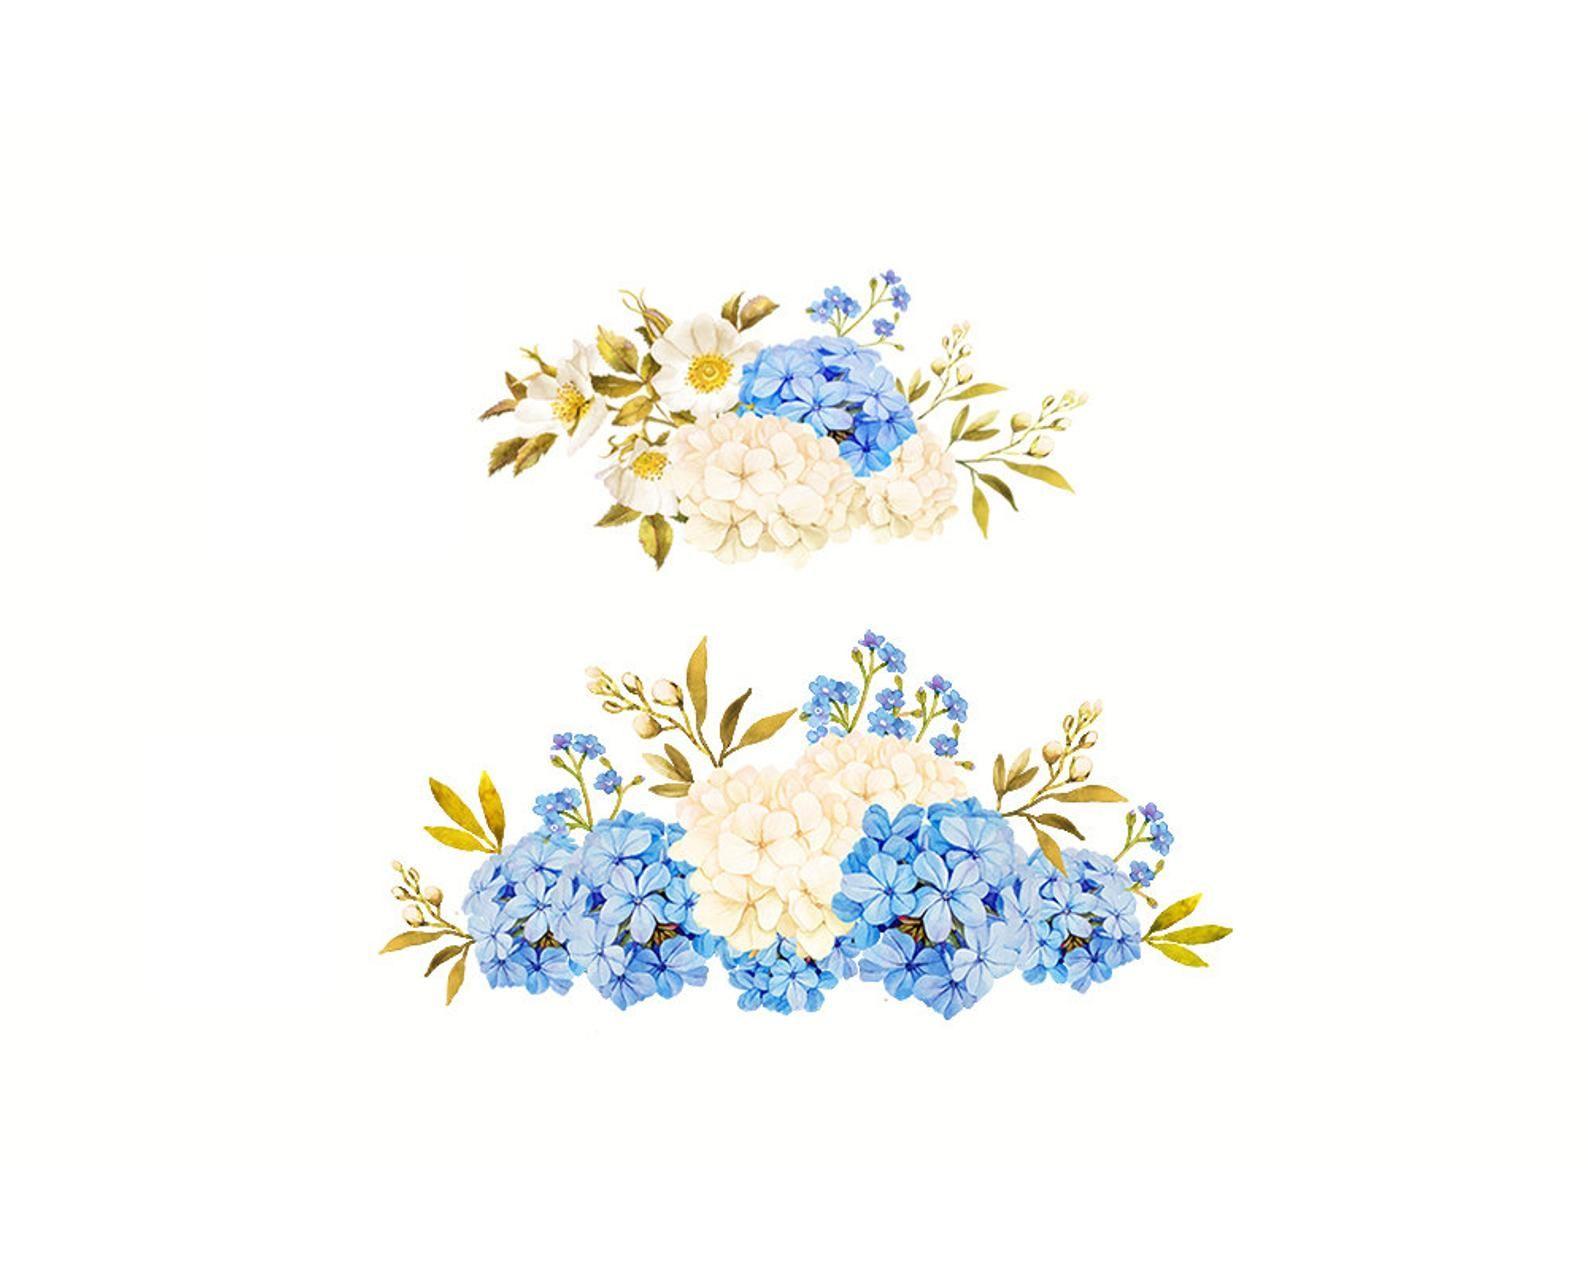 Flower watercolor clipart Floral Clipart Blue jasmine.